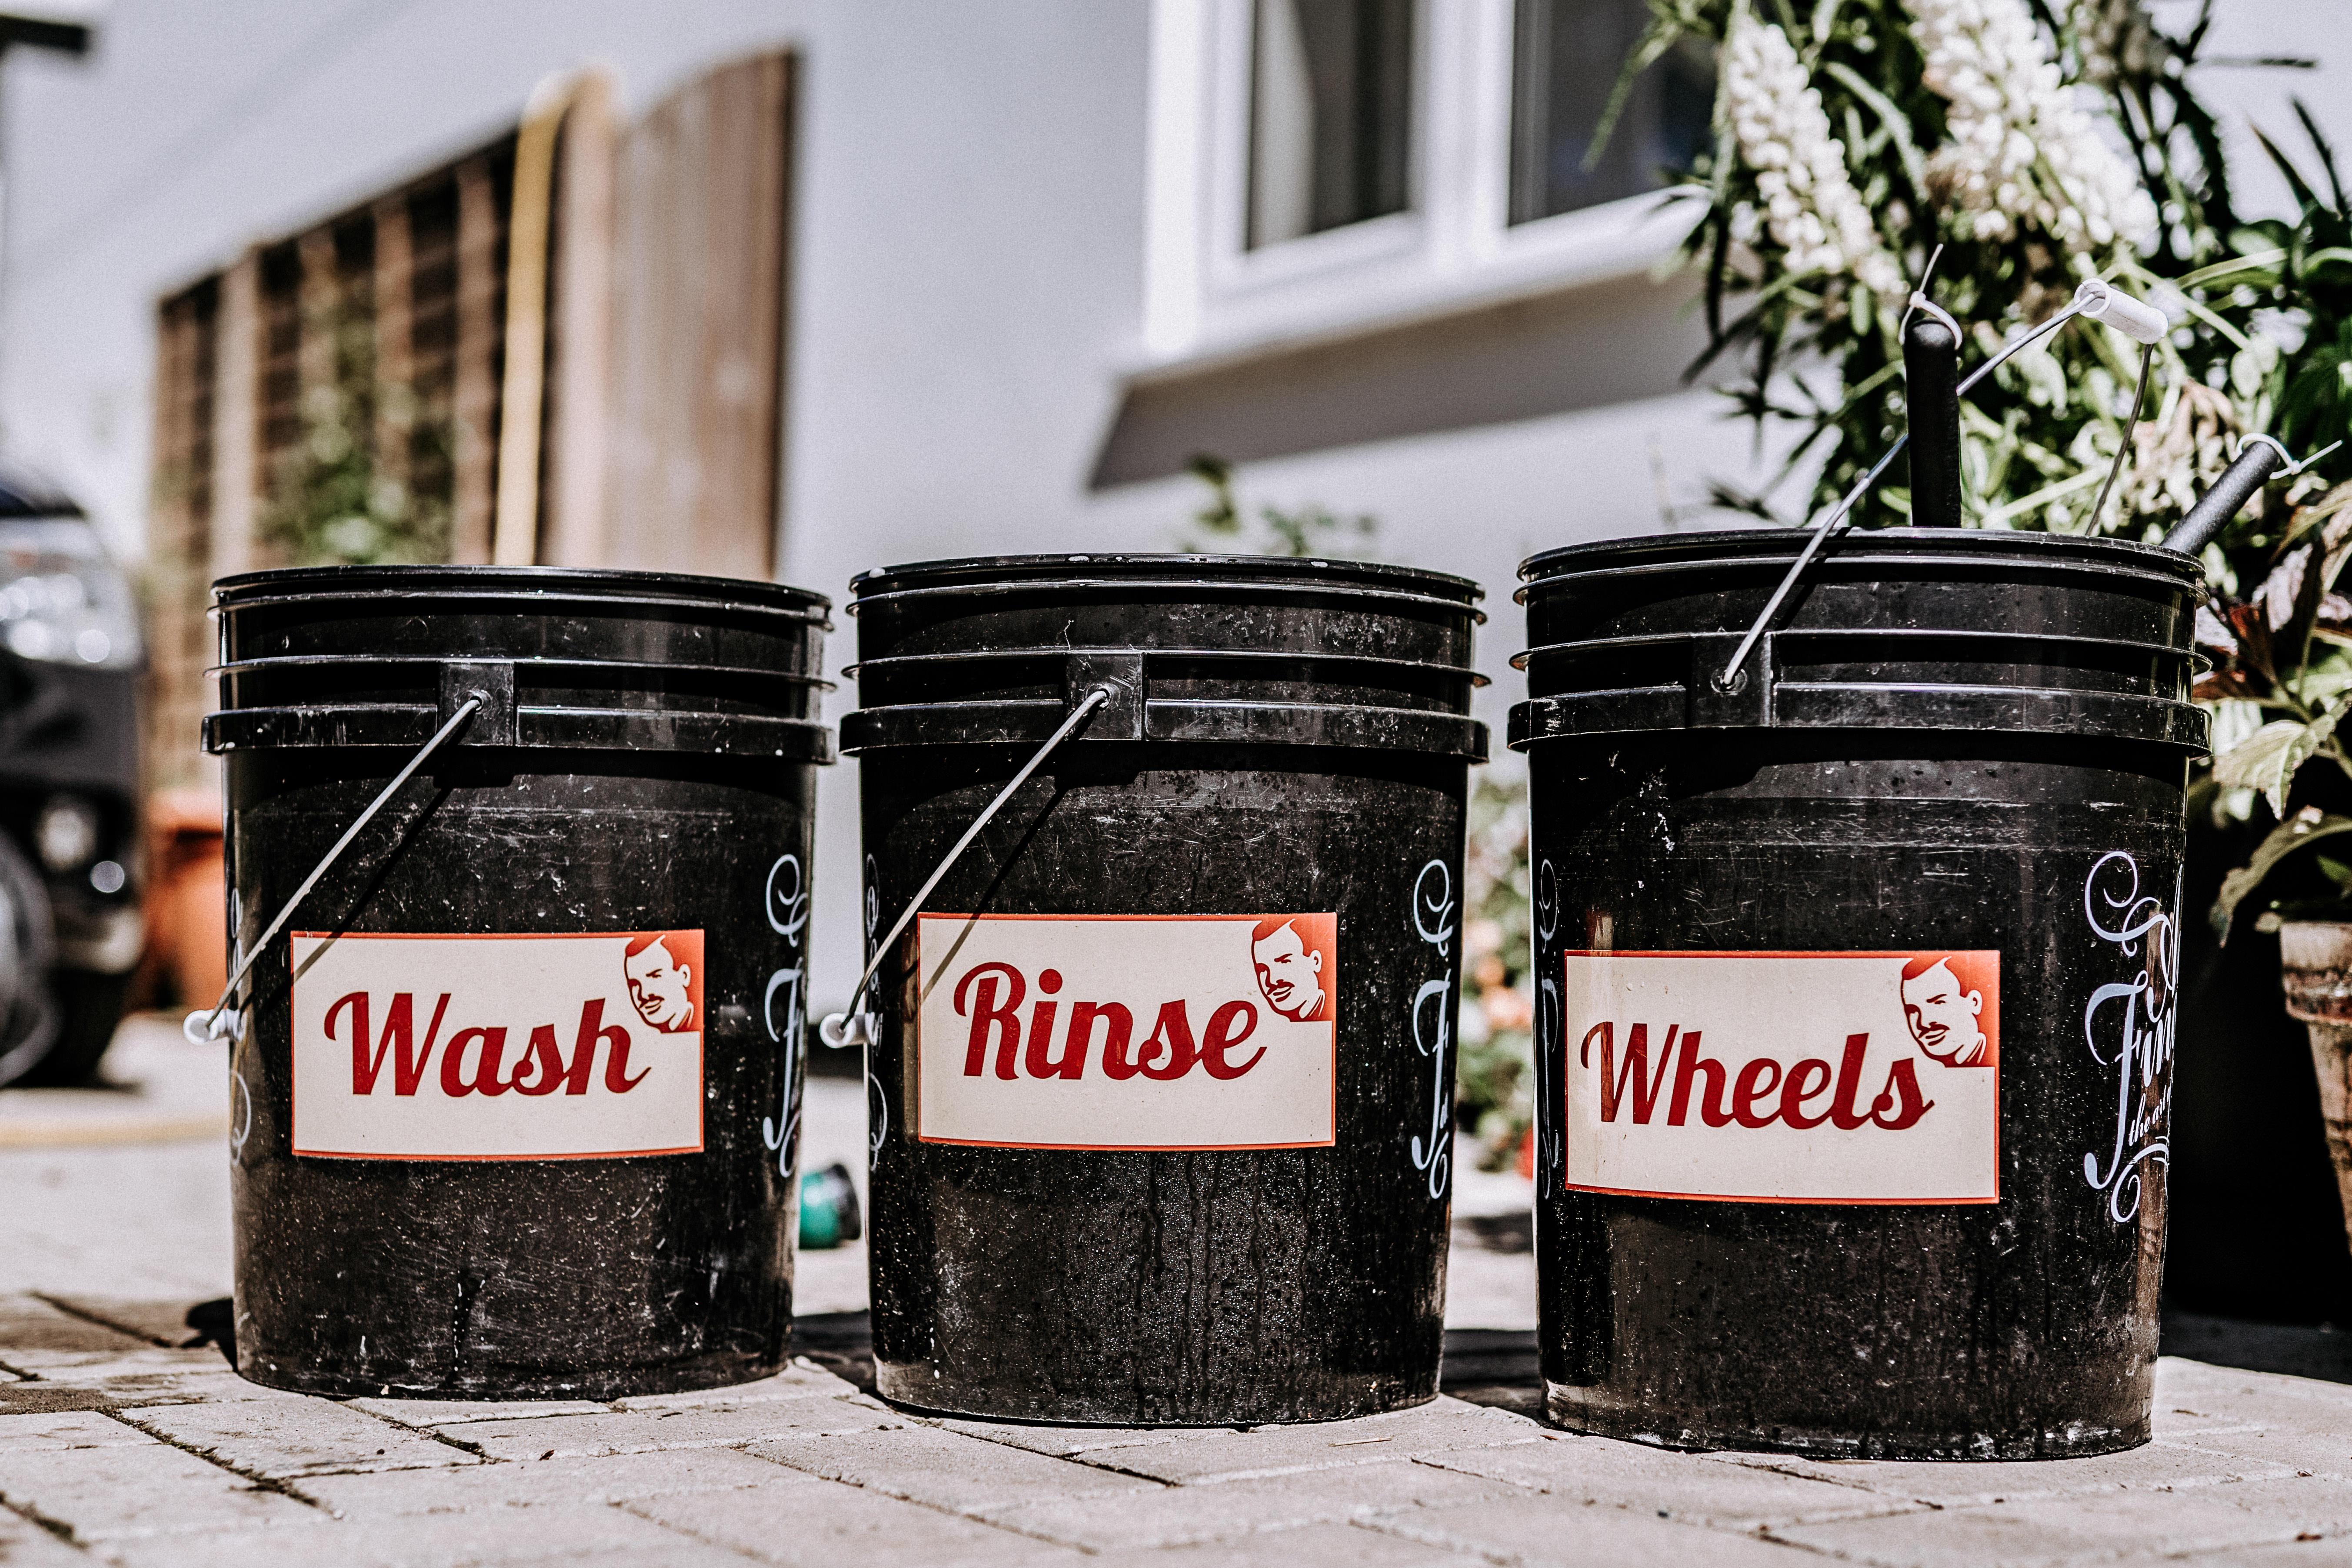 The 2 Bucket Wash Technique